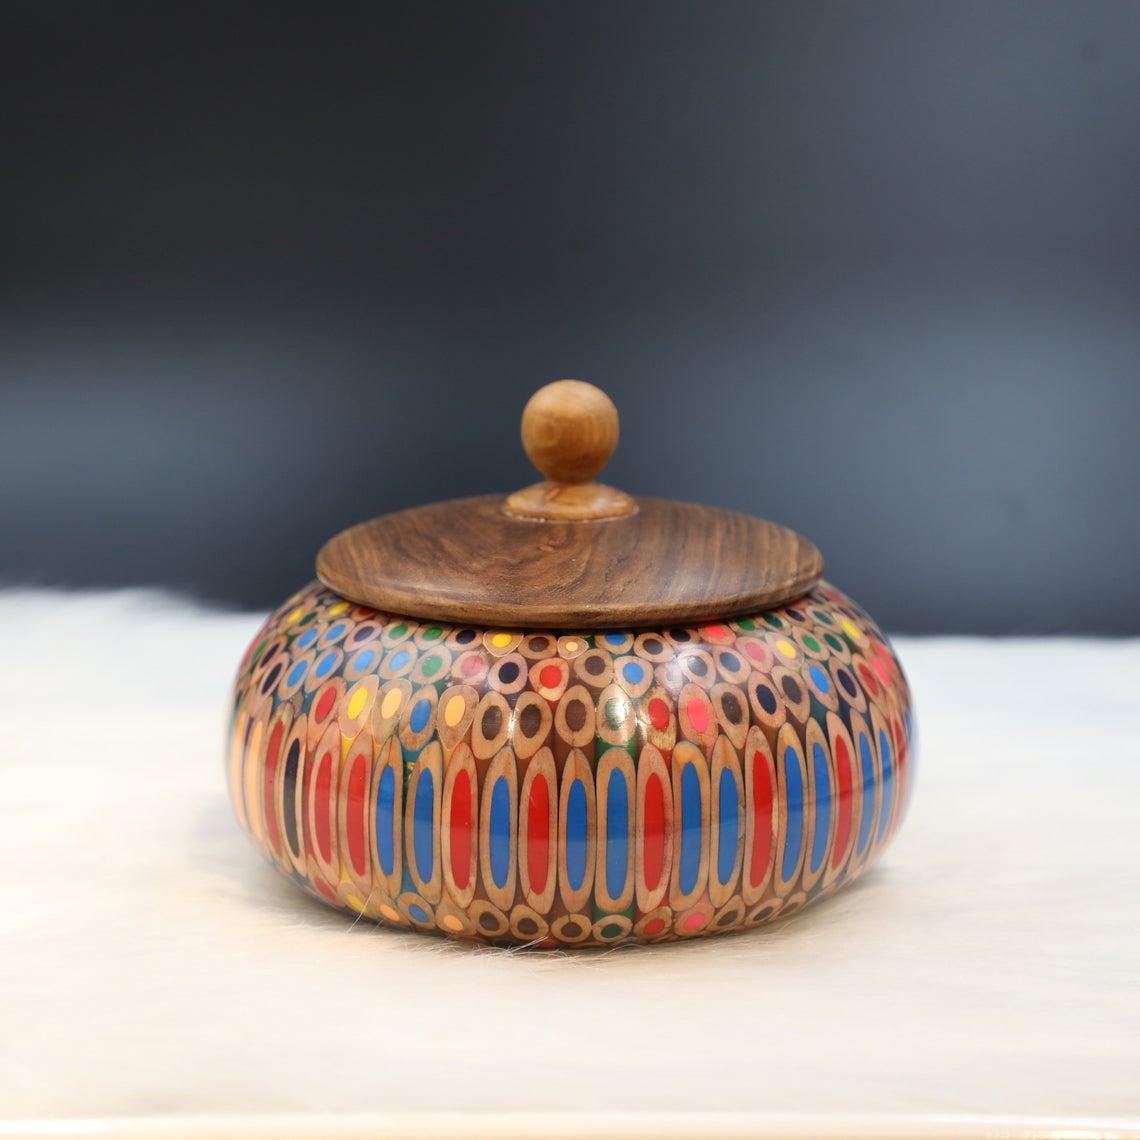 Decorative Colored-pencil Affluence Bowl I